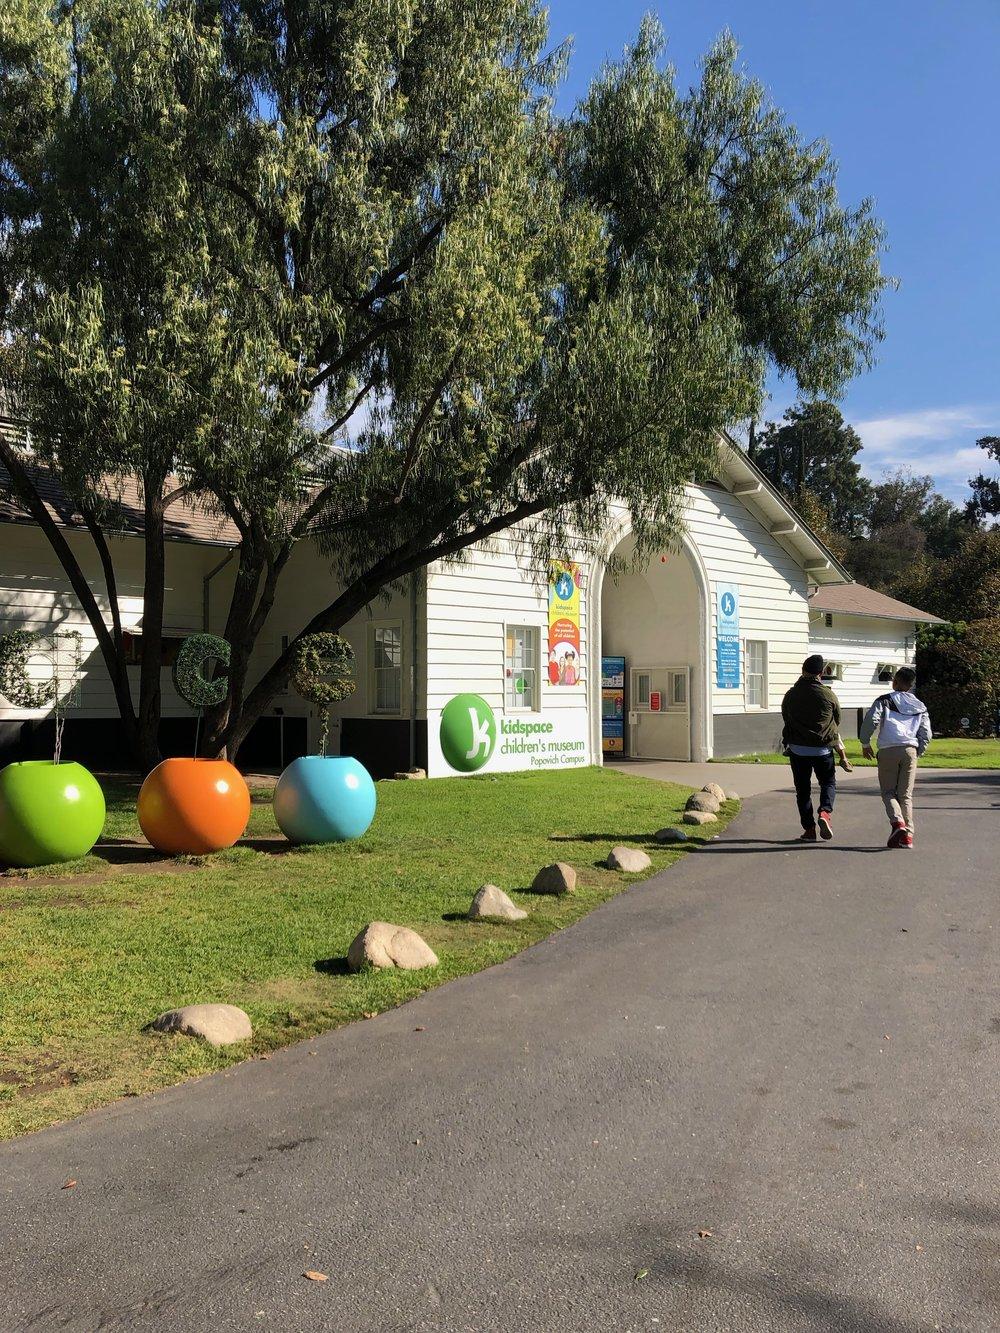 Kidspace Museum on meethaha.com